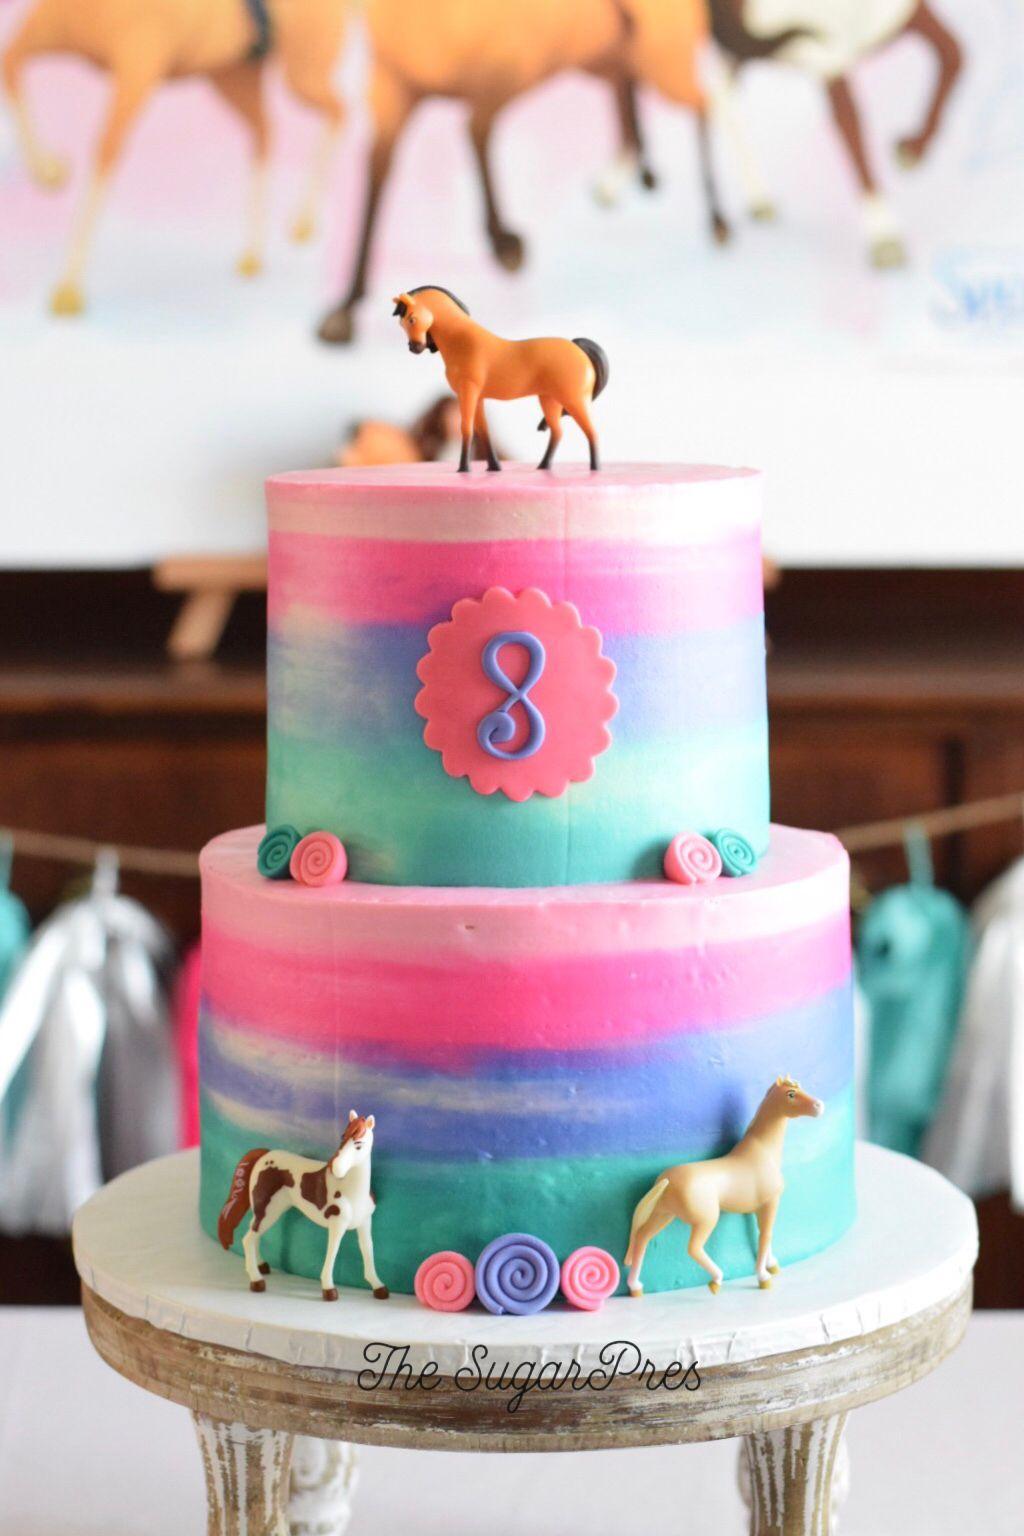 Sensational Spirit Spiritridingfree Birthdaycake Birthday Vanillacake Funny Birthday Cards Online Benoljebrpdamsfinfo